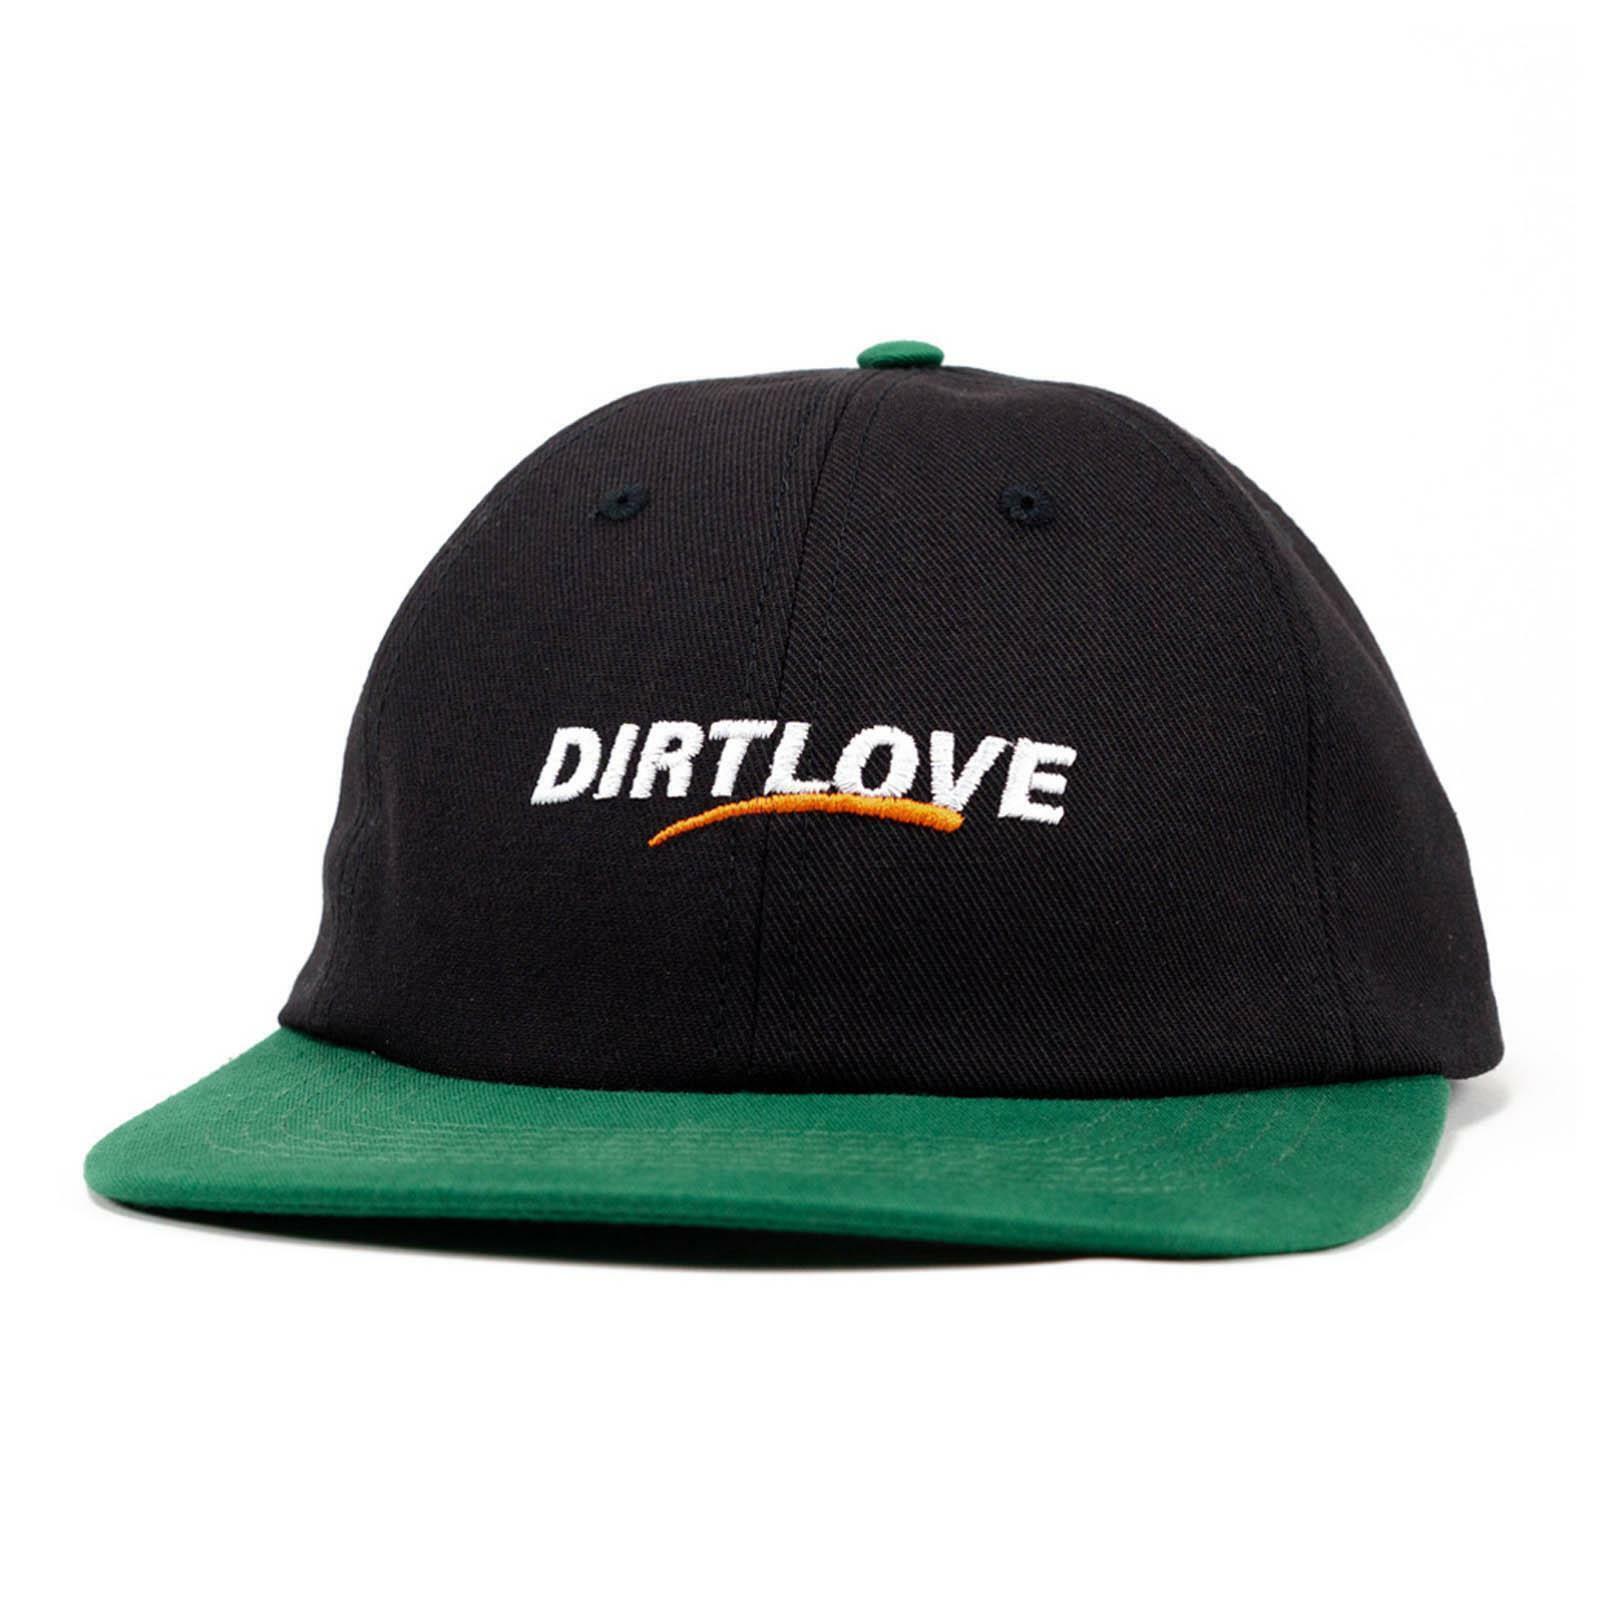 Dirt Love Clothing Cap Concern 6Panel Schwarz Grün One Size Verstellbar Kappe